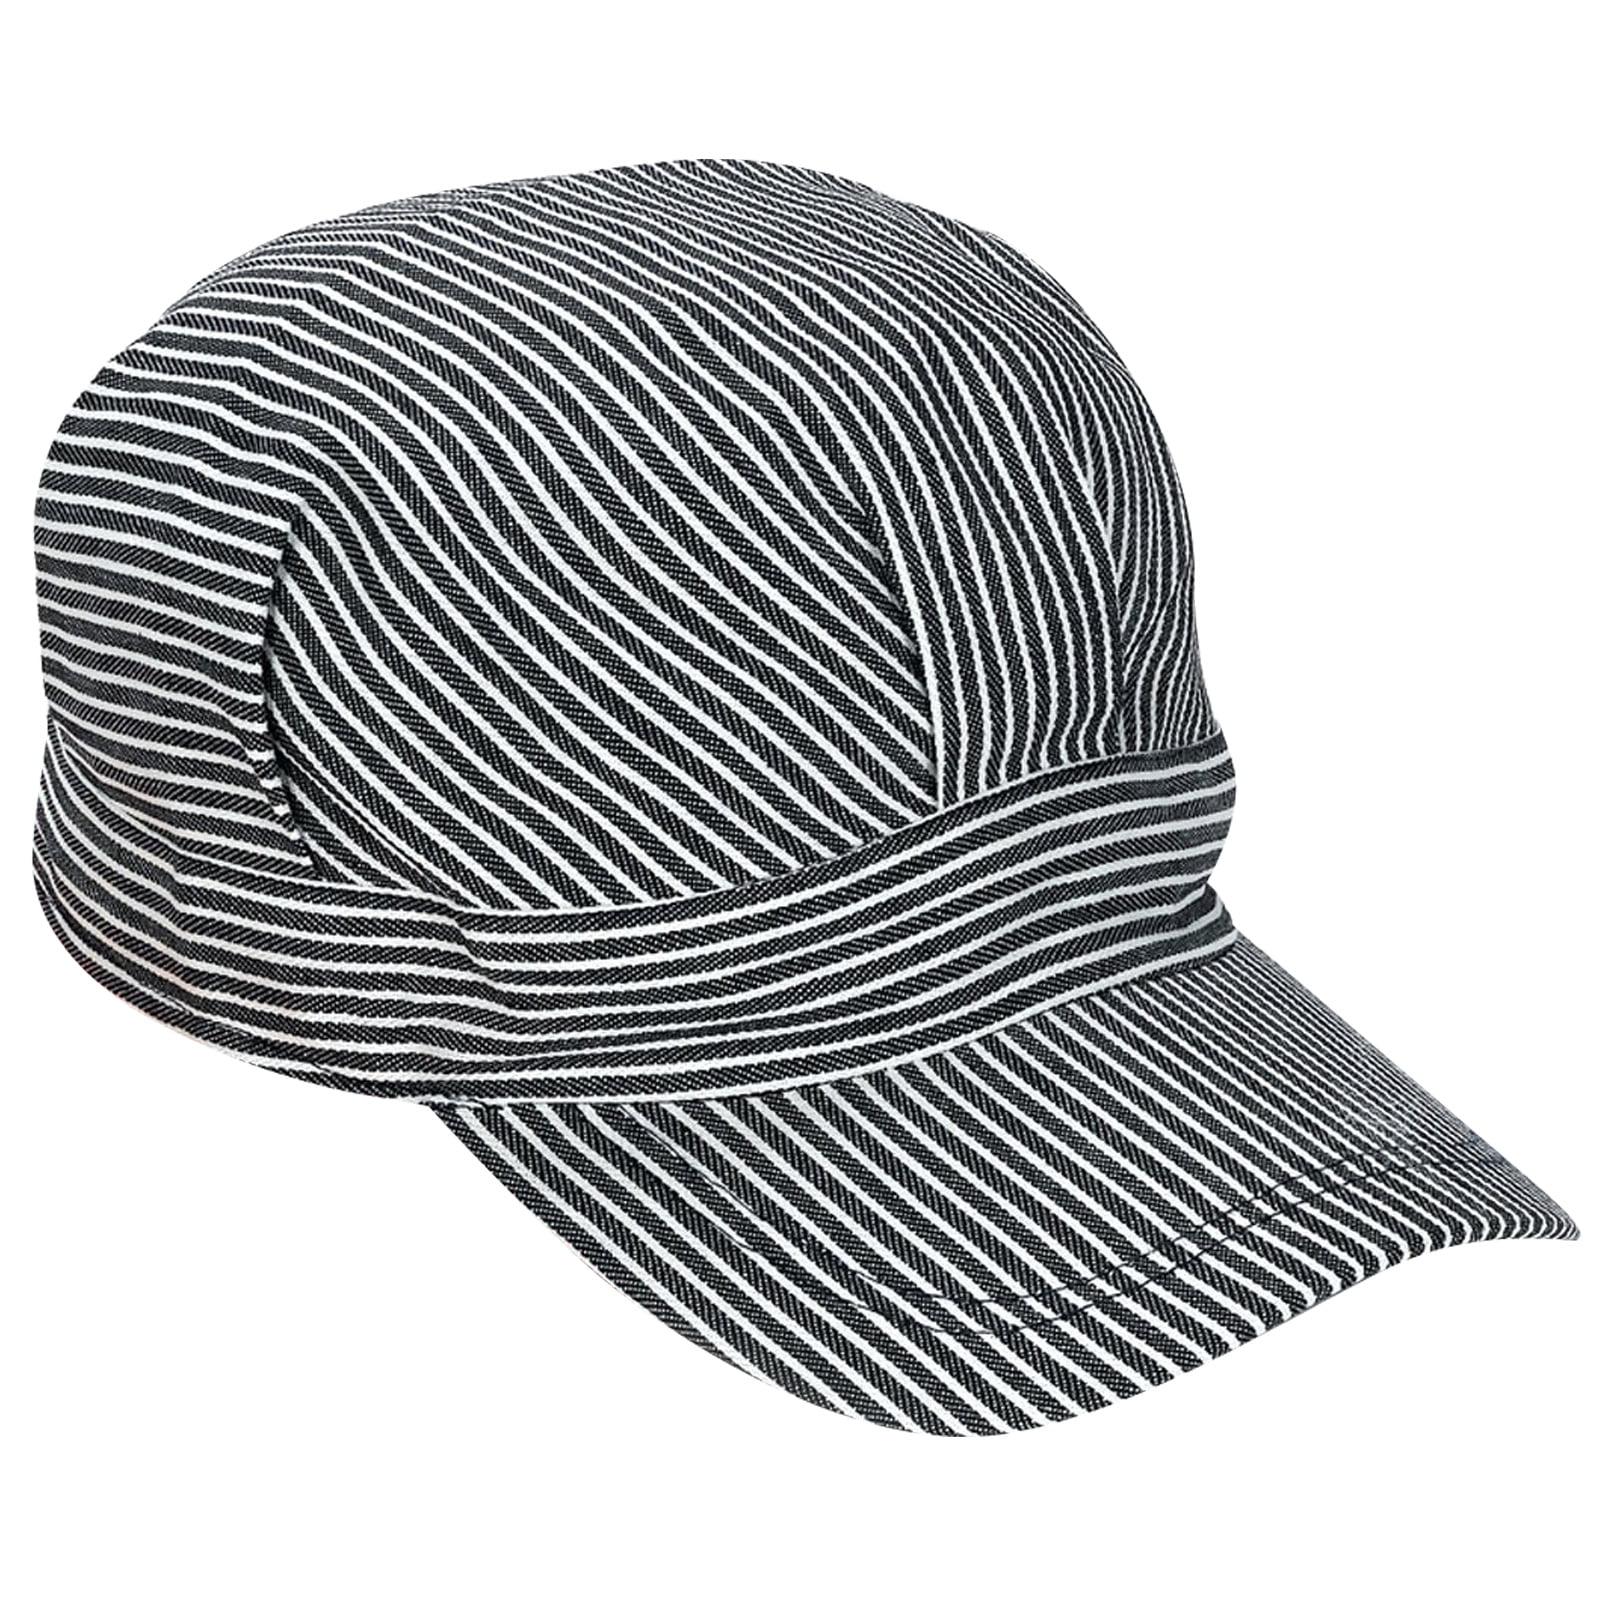 train conductor hats